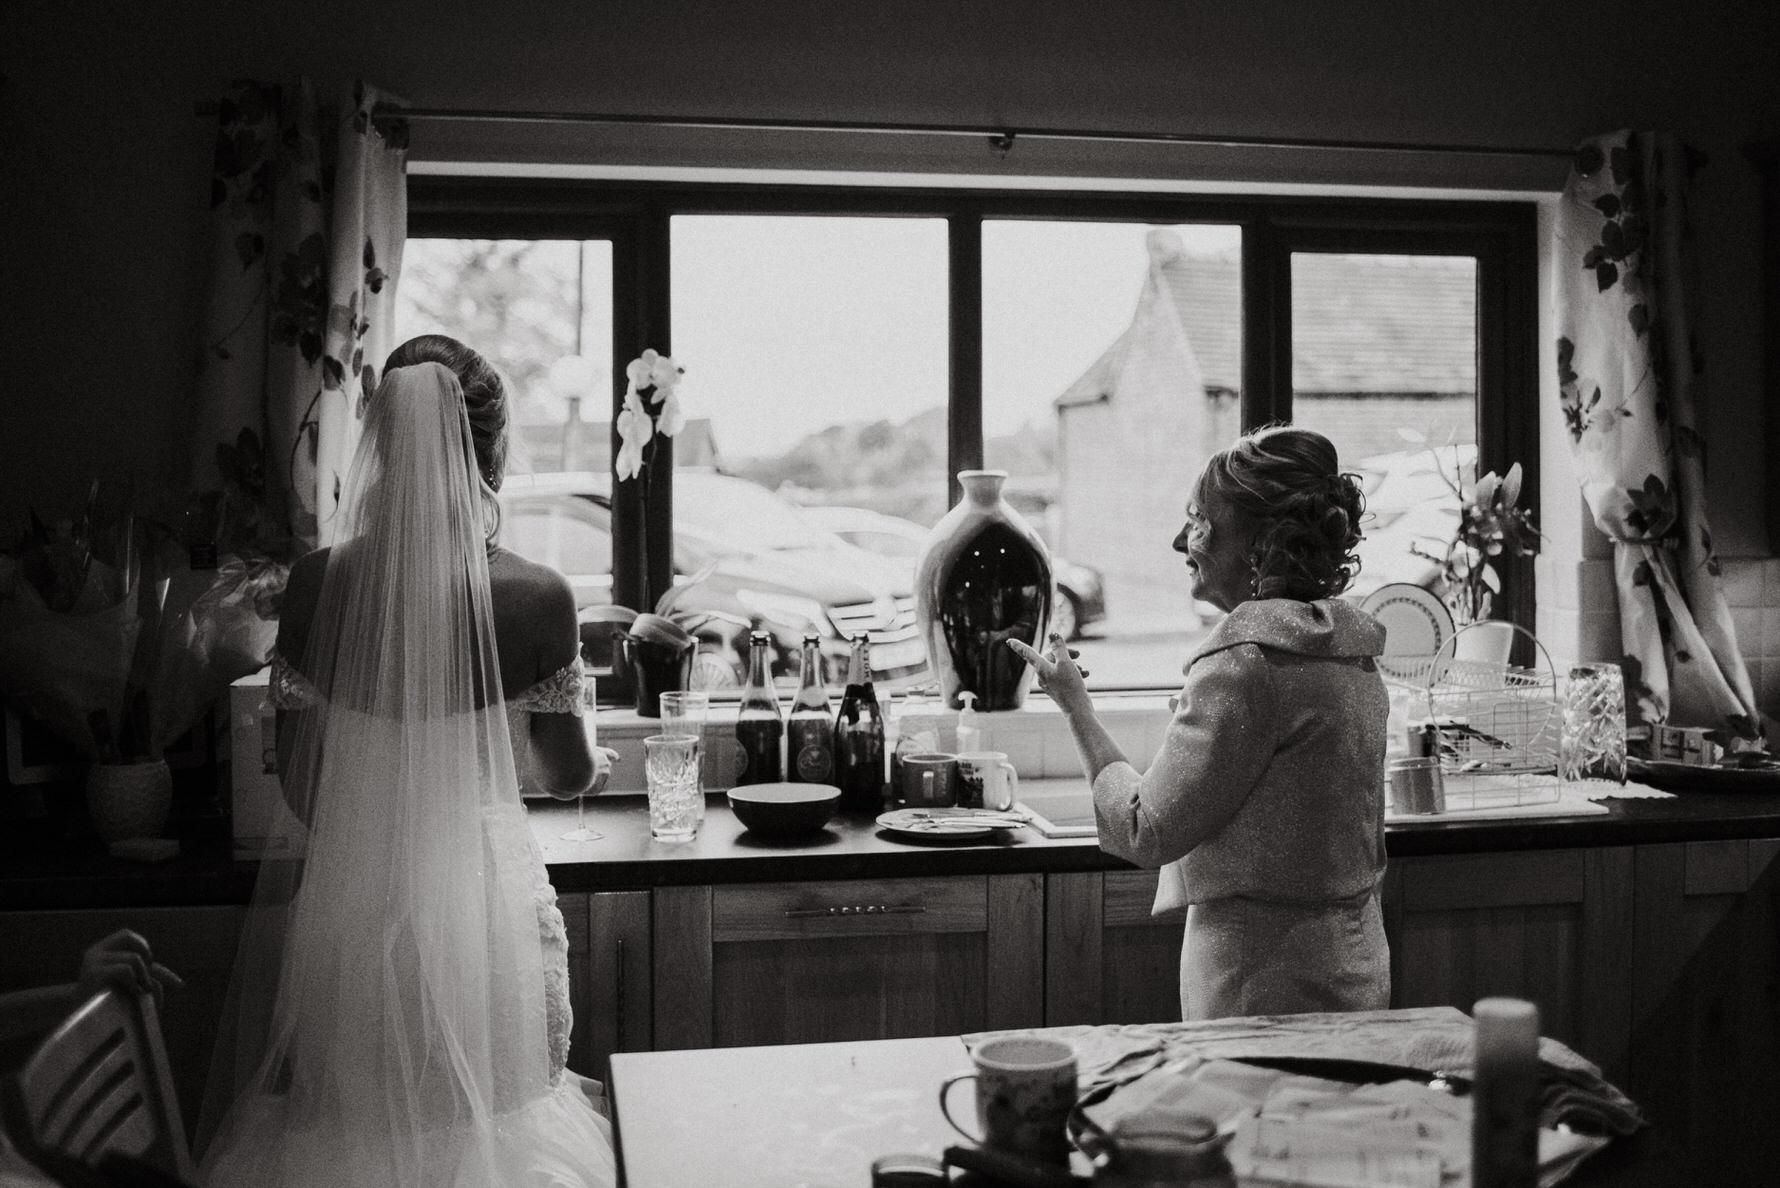 Cheshire Wedding Photojournalism - A bride and her mum